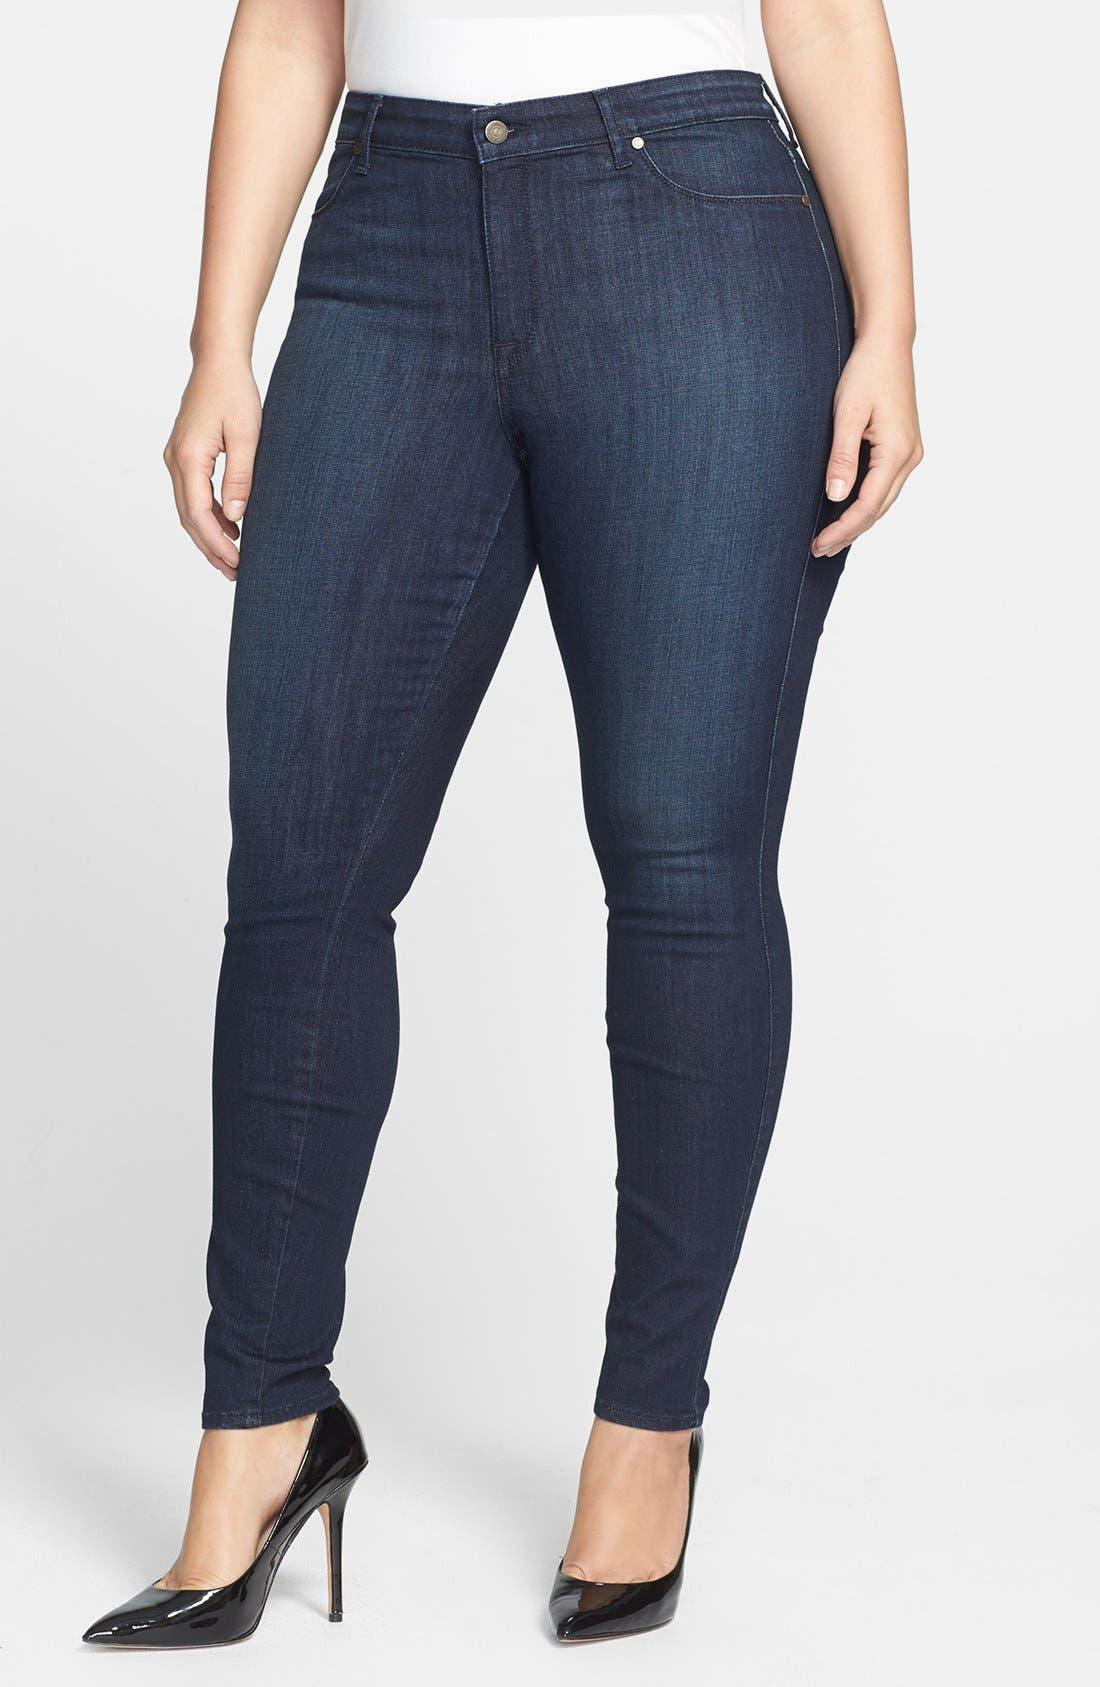 'Joy' Legging Style Stretch Jeans,                             Main thumbnail 1, color,                             400